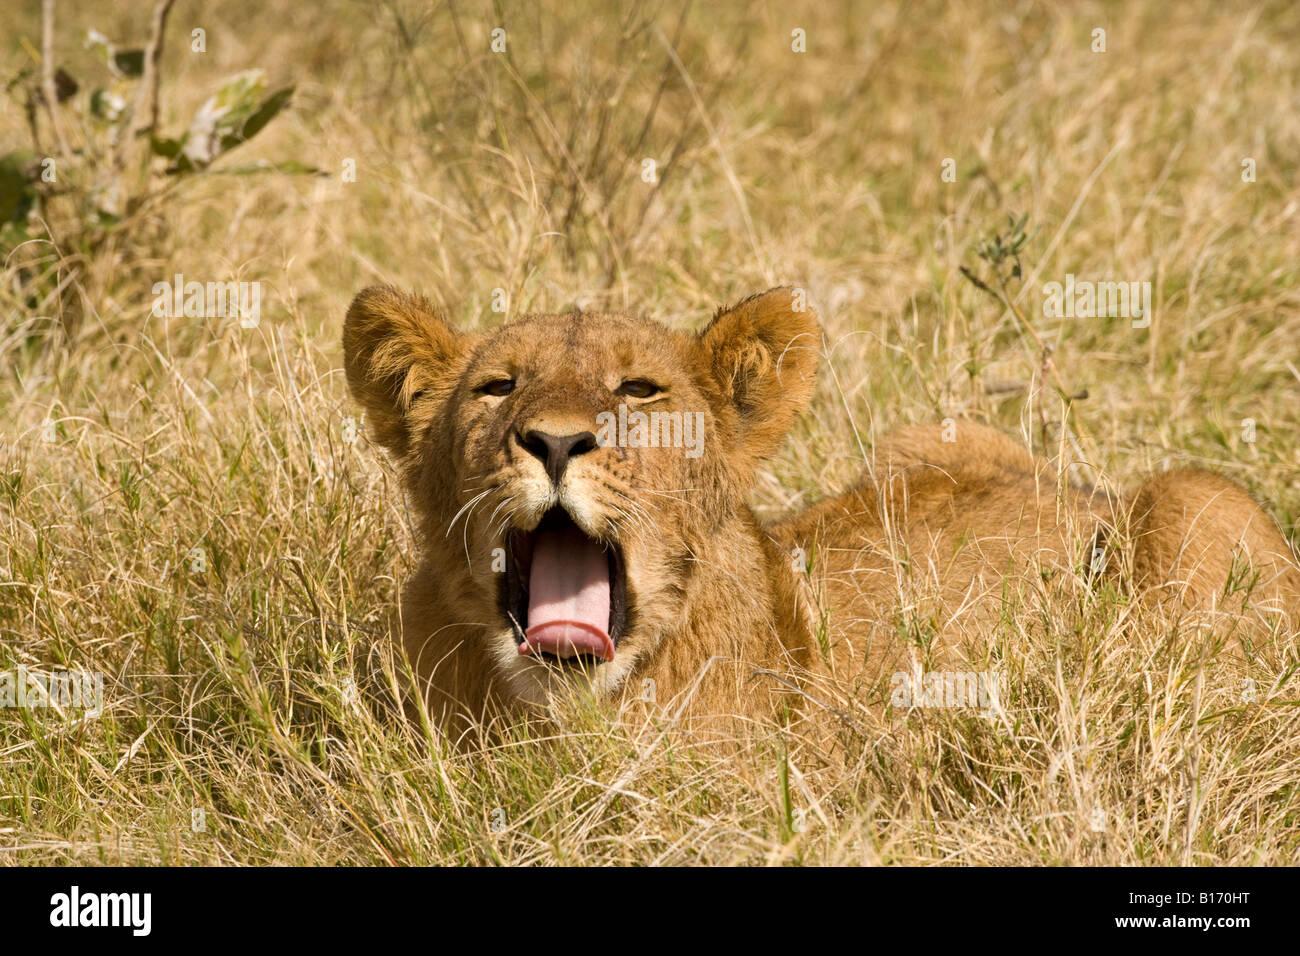 Closeup cute funny lion cub yawning mouth open wide tongue out lying in  warm sunshine in open grass facing view eye contact Okavango Botswana Africa Stock Photo